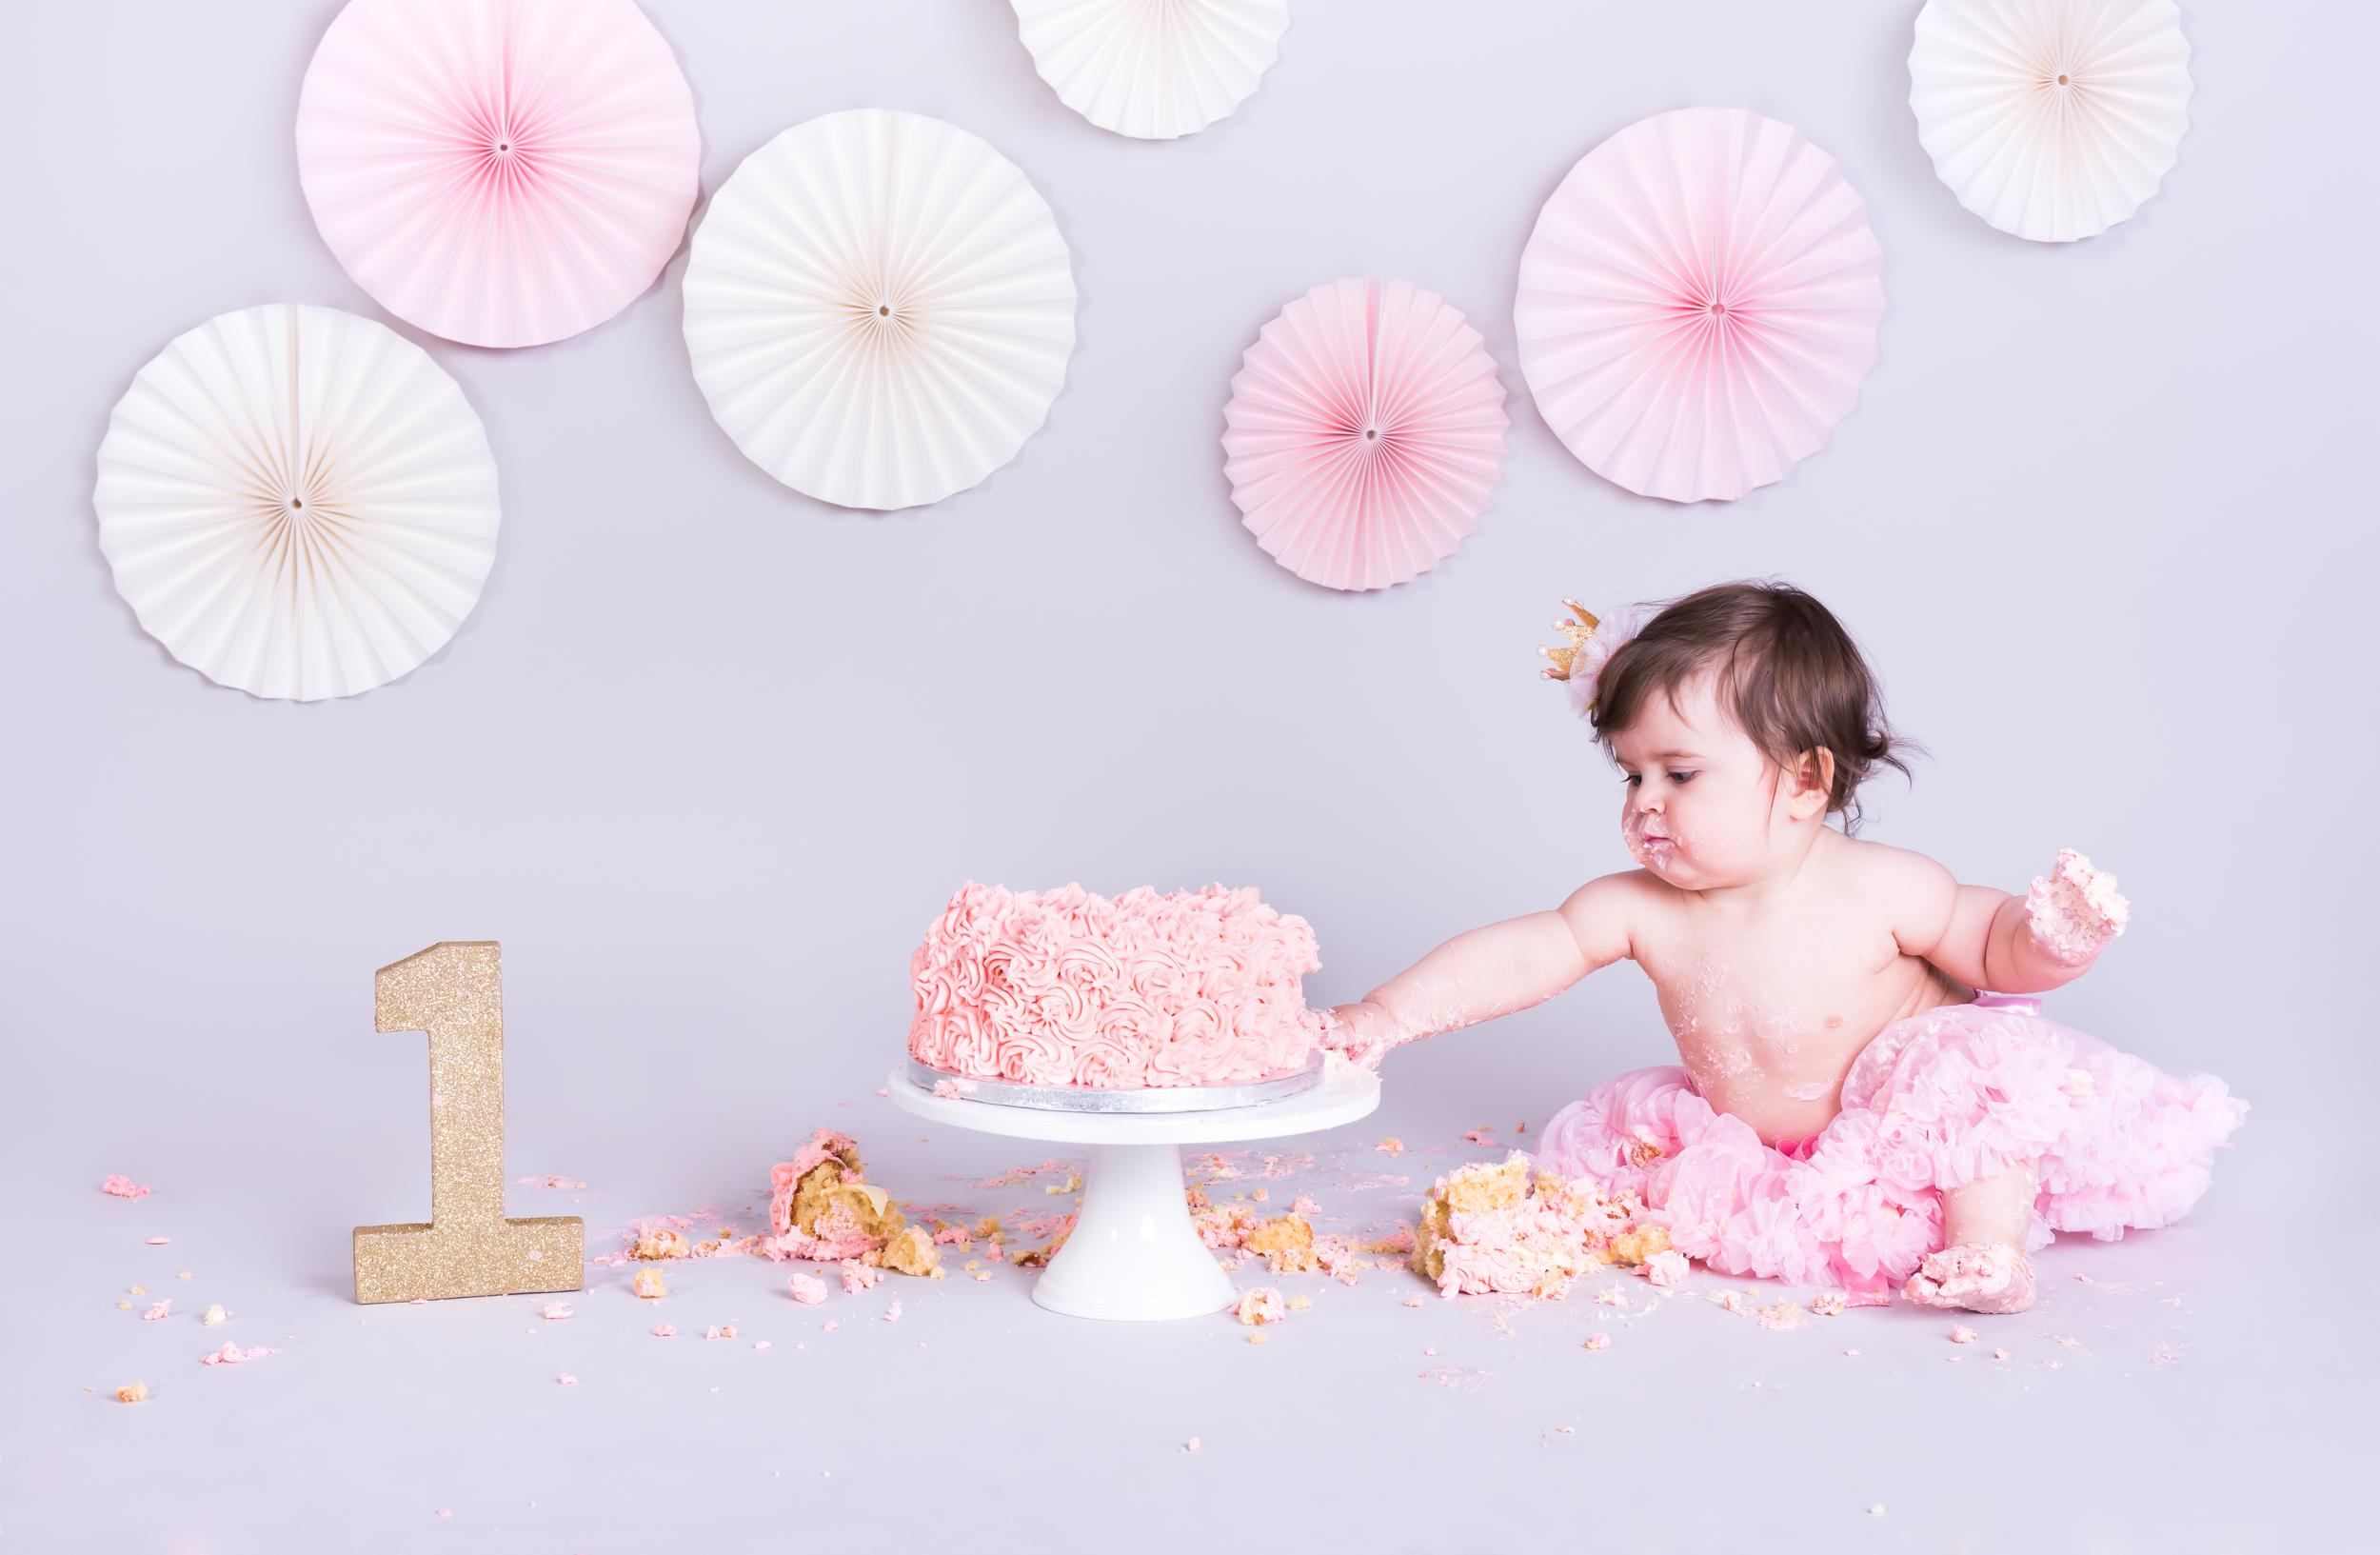 Baby portraits essex, baby portraits benfleet essex, baby portraits chelmsford essex, baby portraits southend essex, cake smash photography benfleet, cake smash photography essex